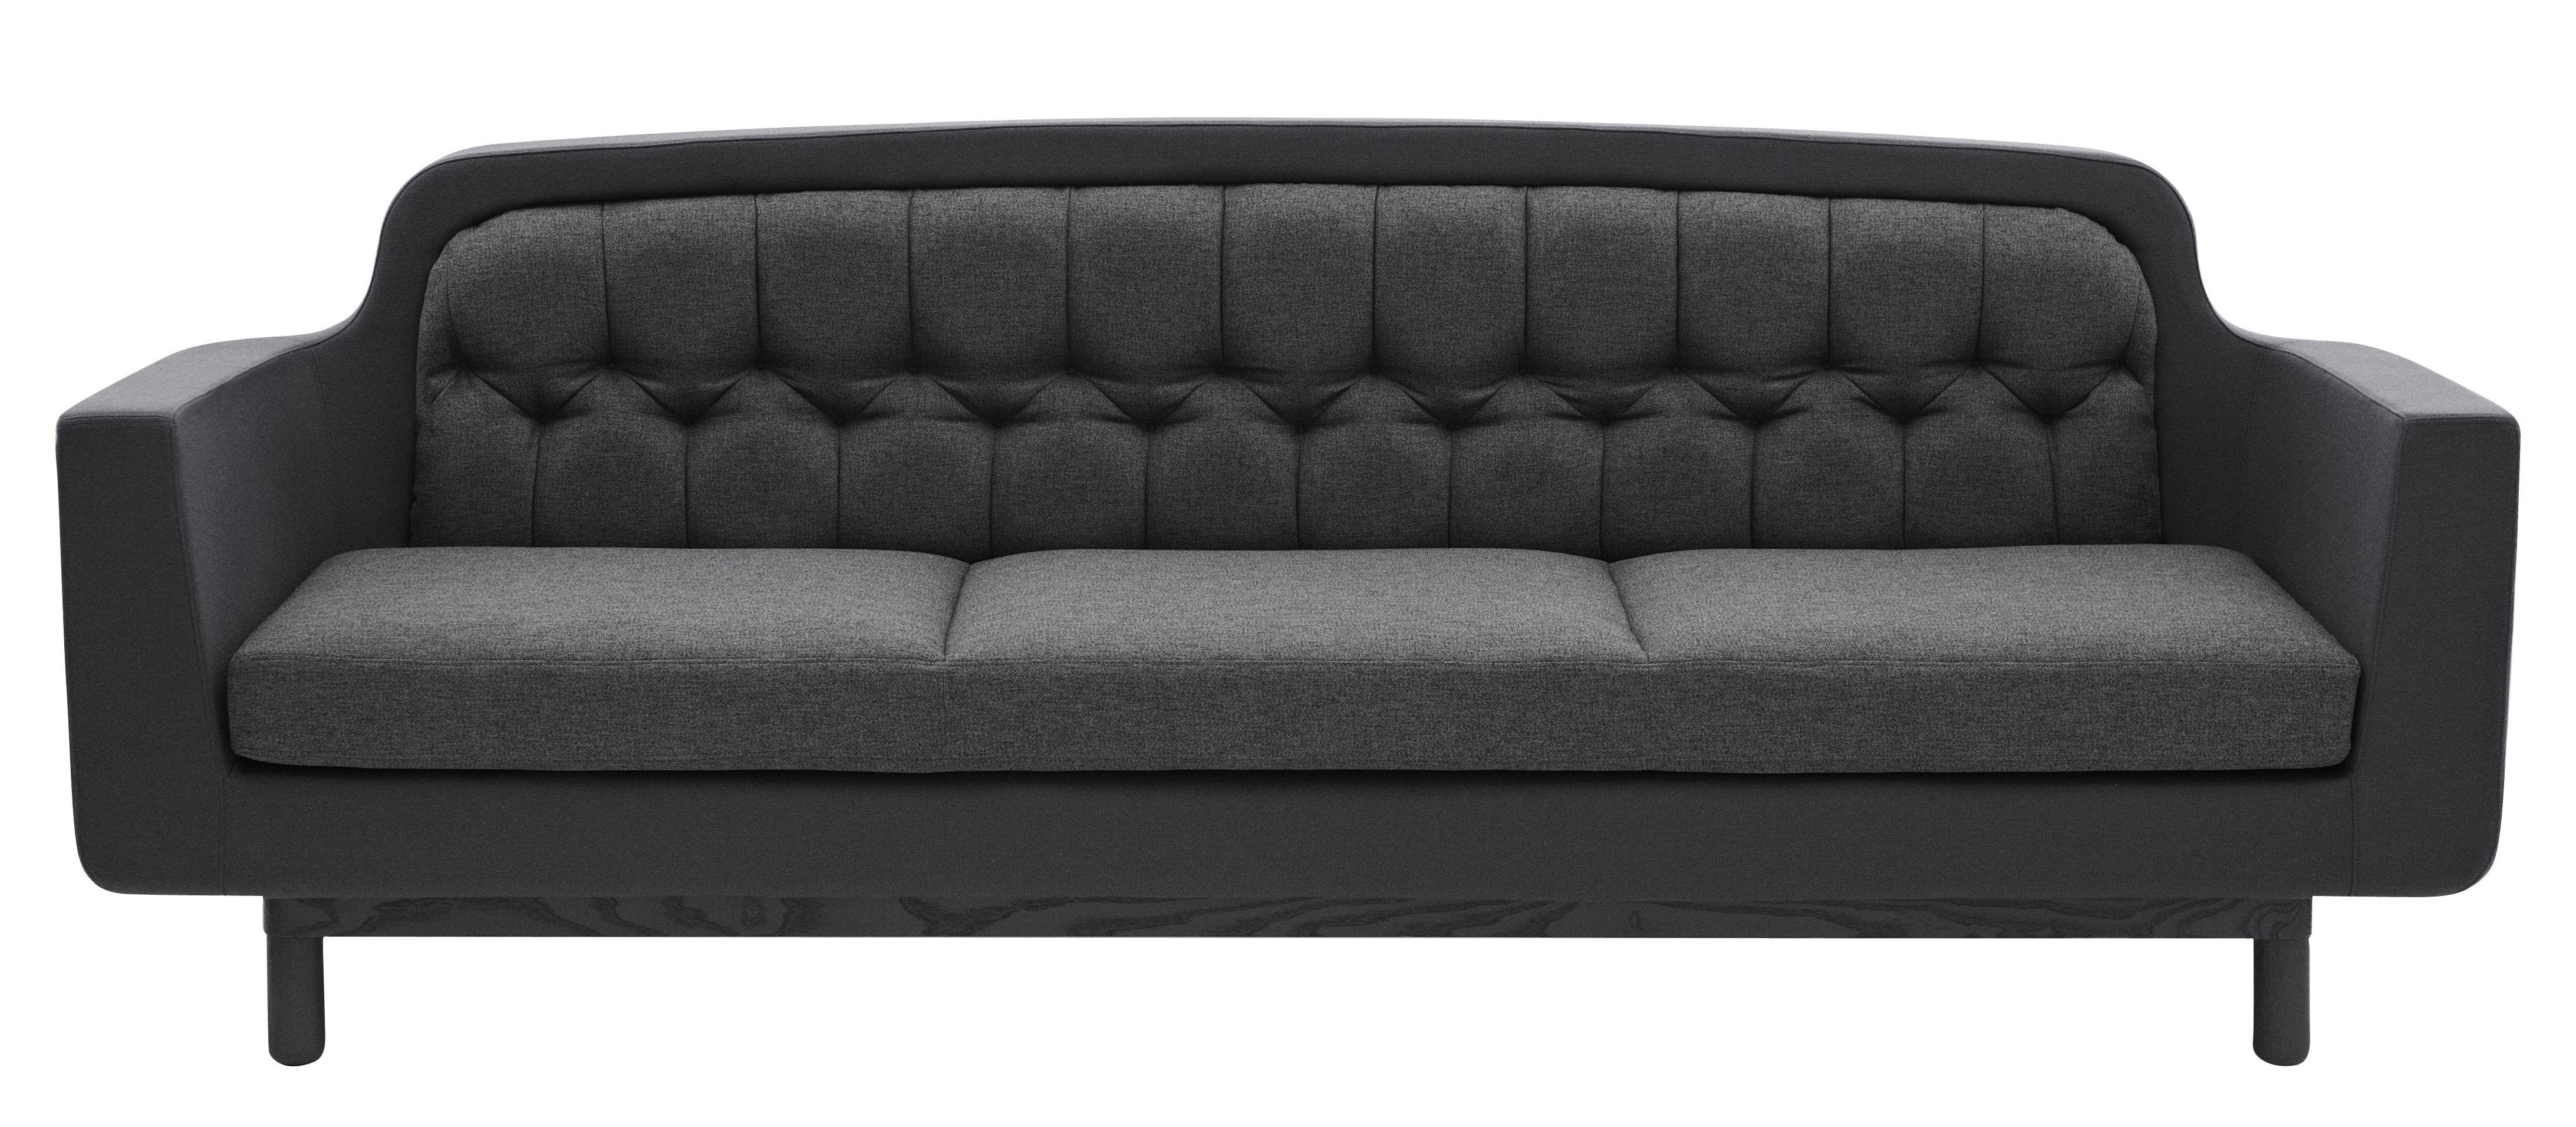 Möbel - Sofas - Onkel Sofa B 235 cm - 3-Sitzer - Normann Copenhagen - Dunkelgrau - Holz